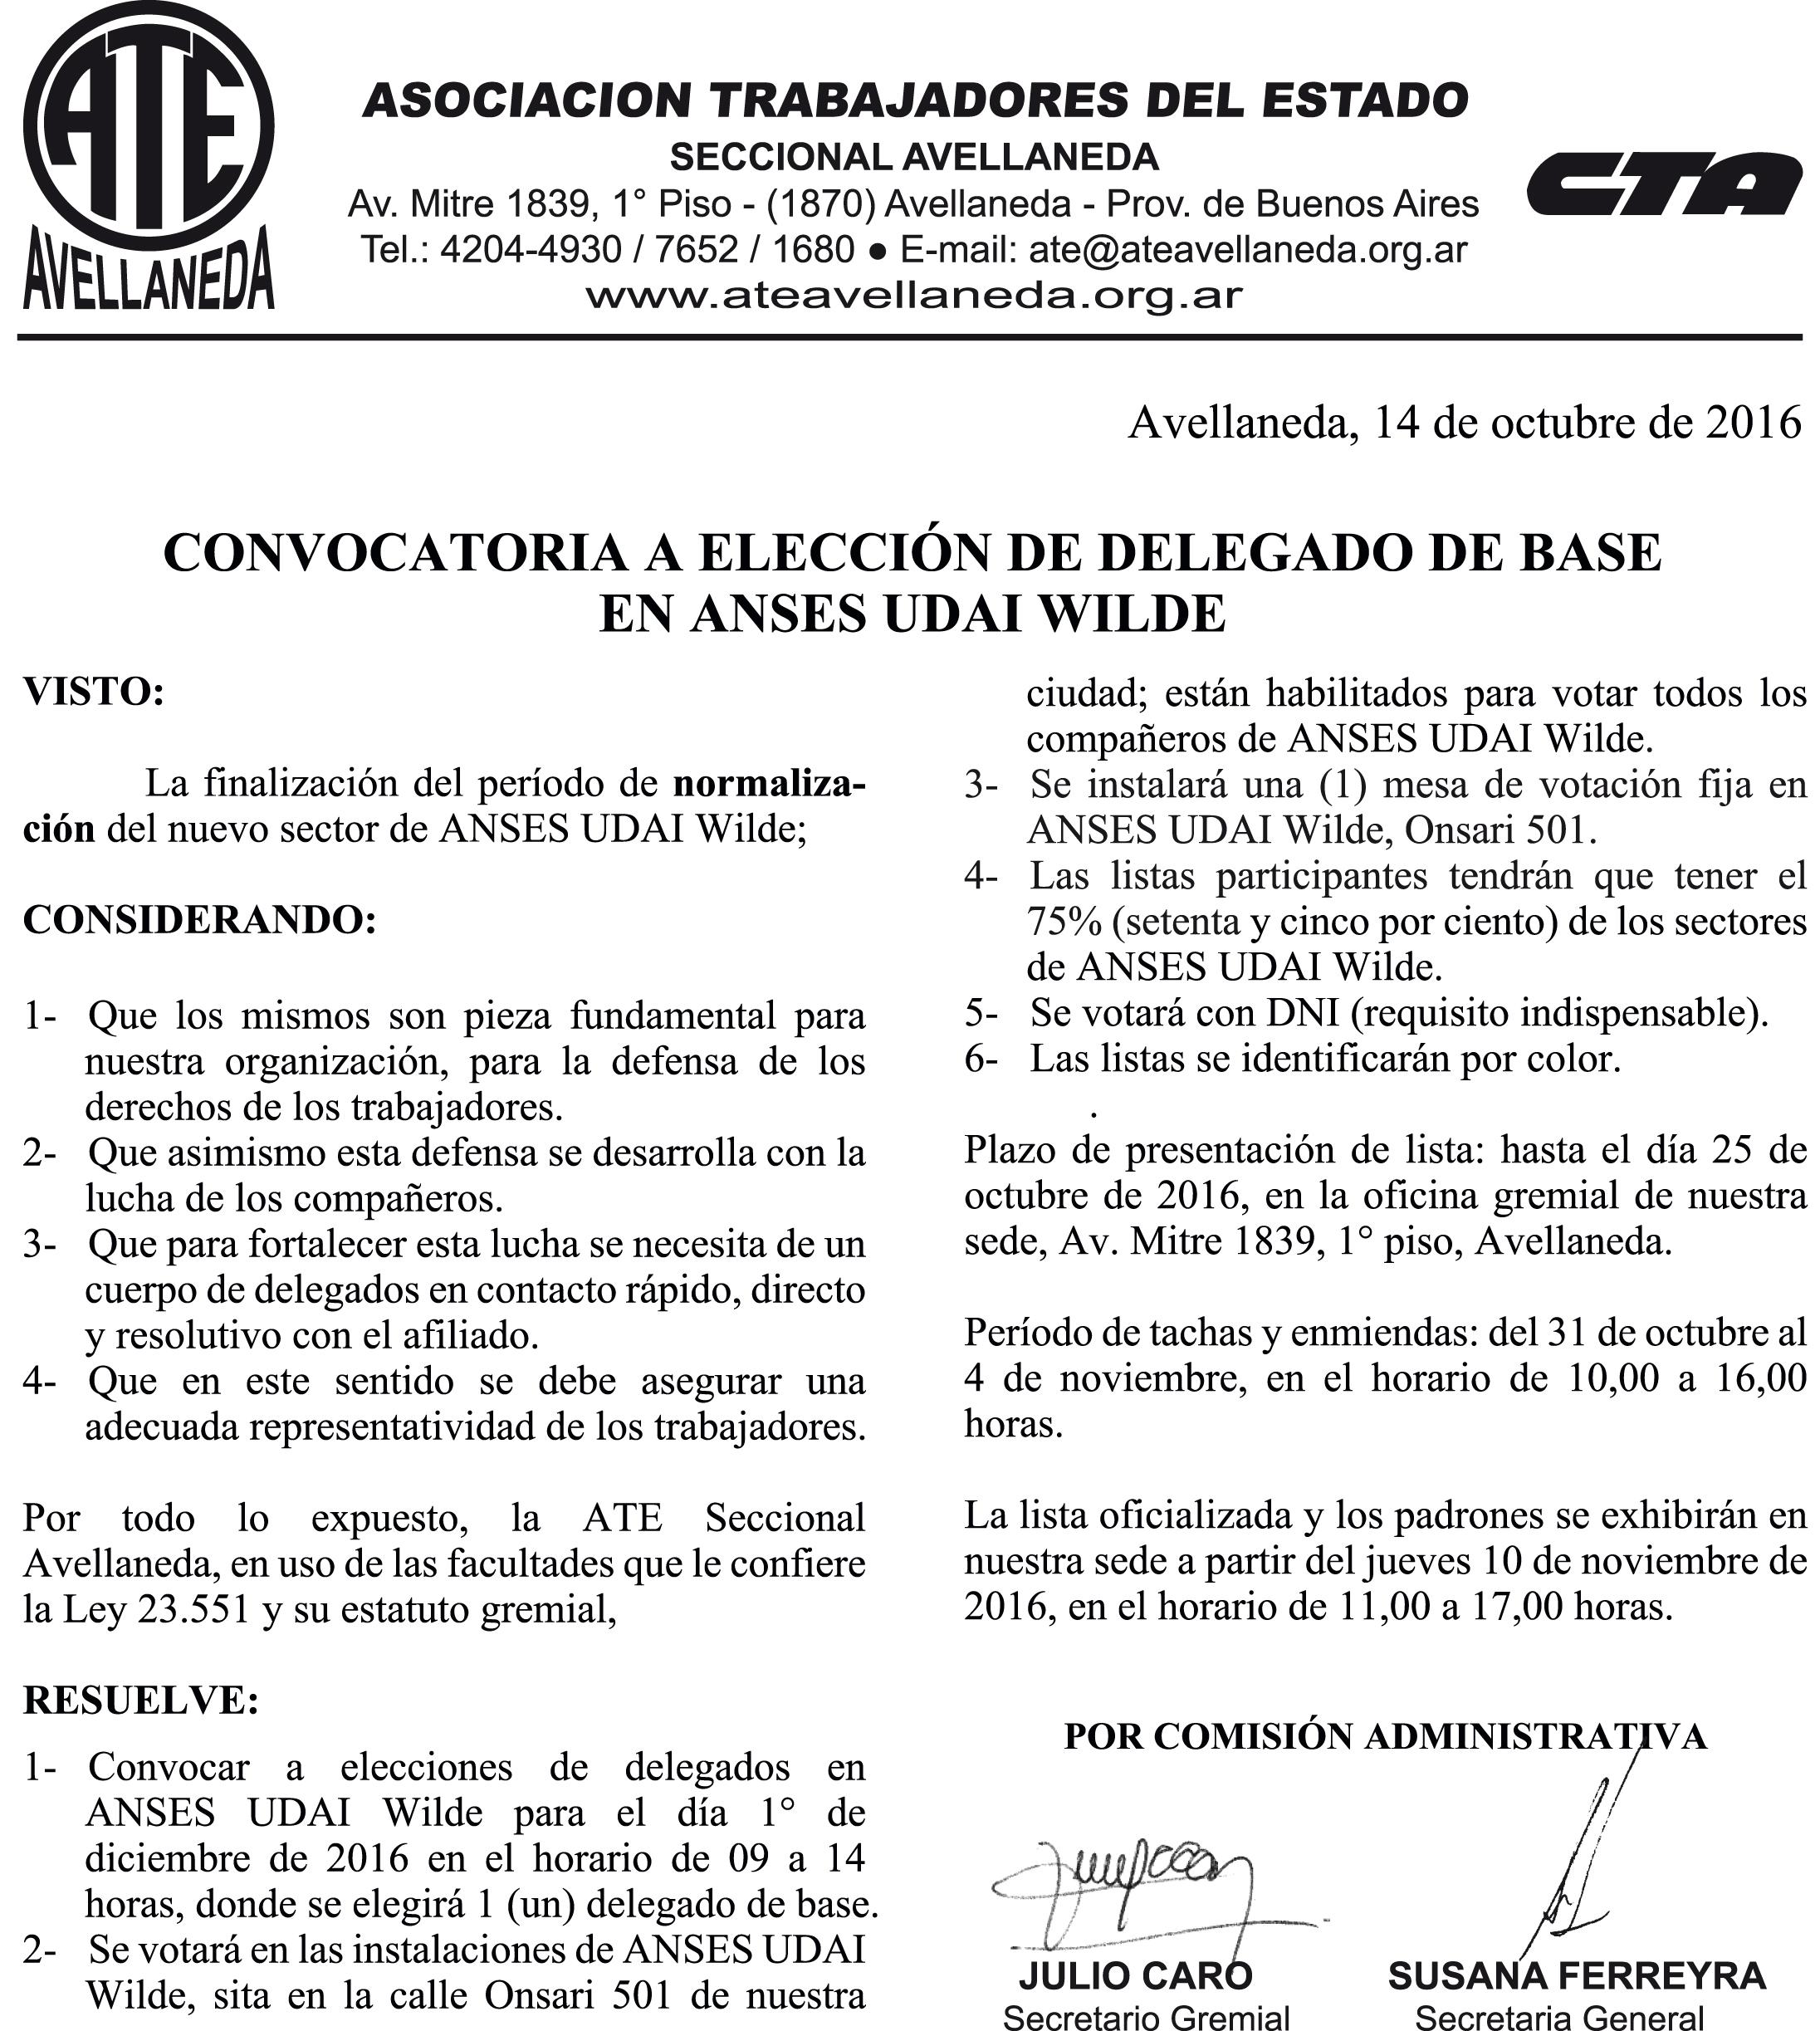 14-10-16 CONVOCATORIA ELECCIONES ANSES UDAI WILDE